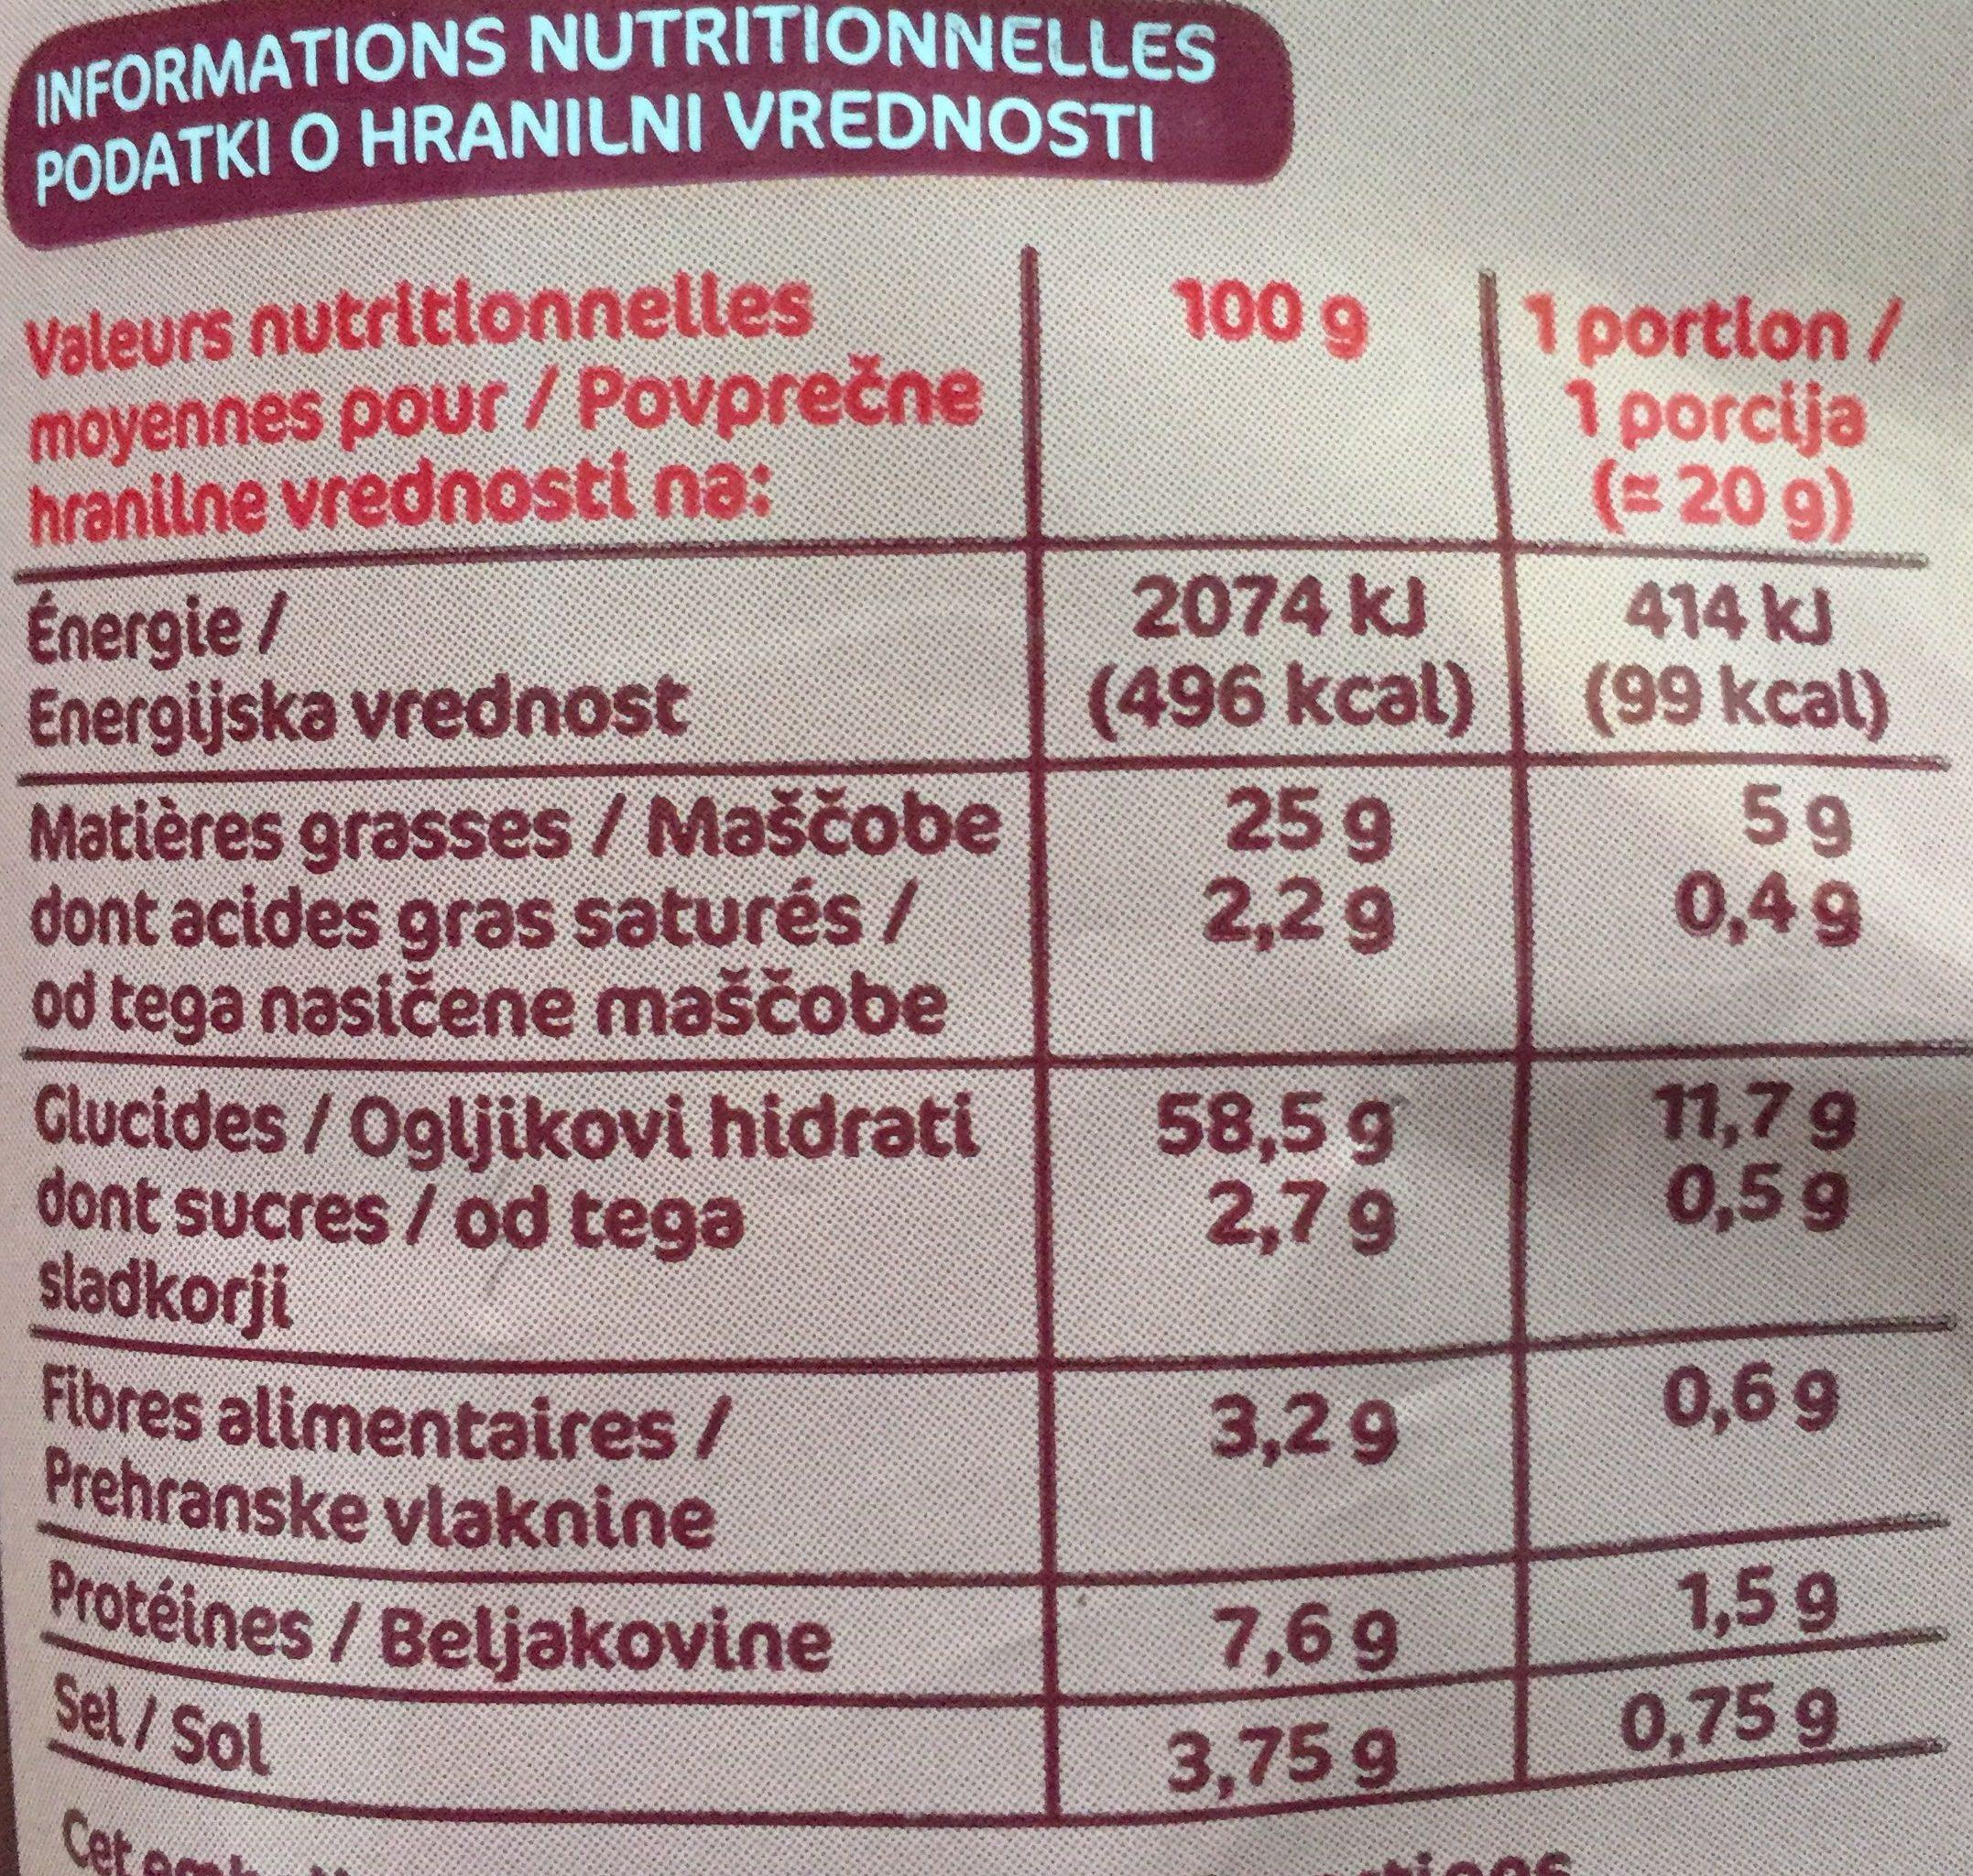 Snacks au bacon - Informations nutritionnelles - fr